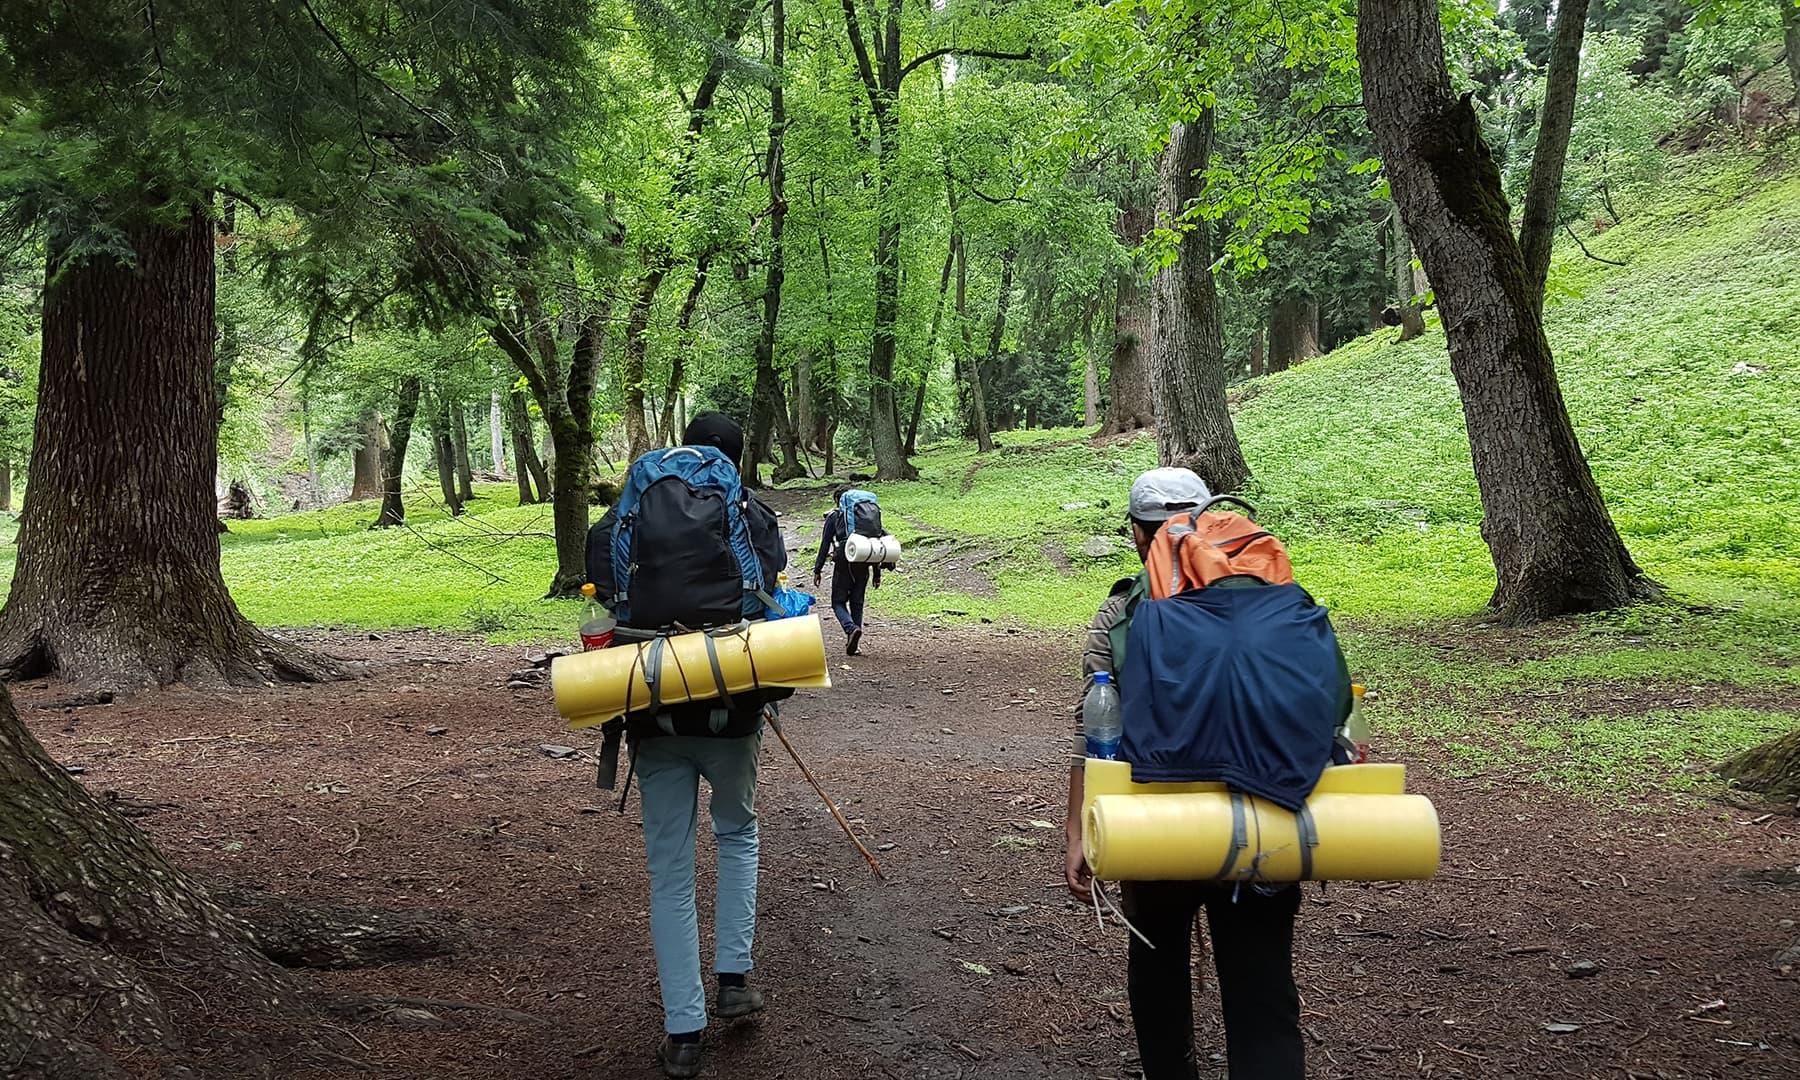 جنگل سے گزرتے ہوئے—اعجاز بھٹی